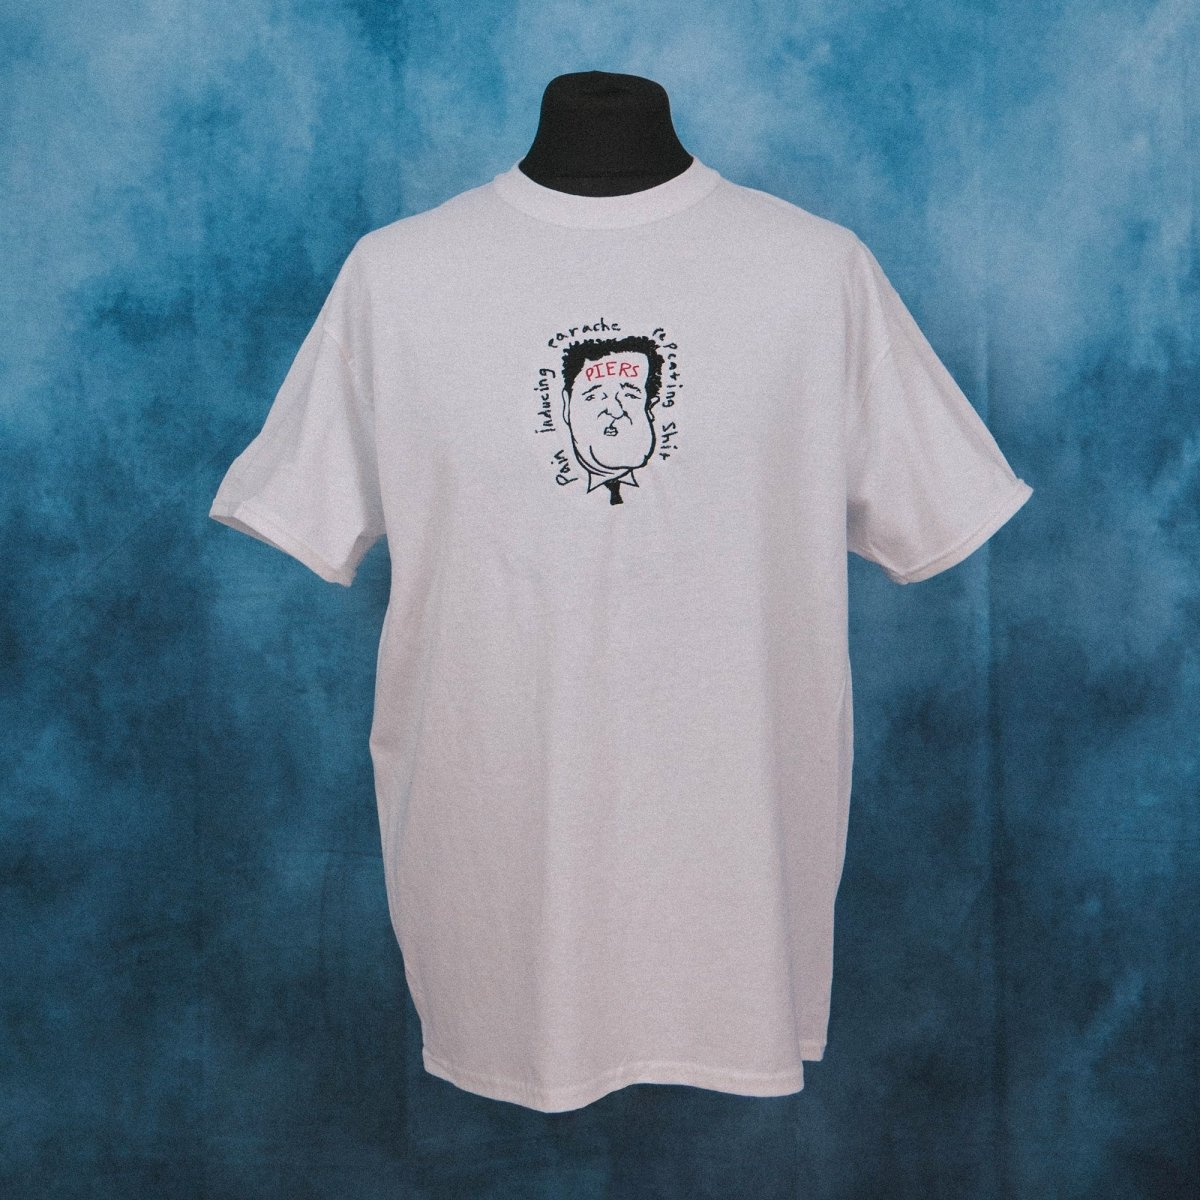 Piers Morgan Meme Unisex Embroidered T-Shirt